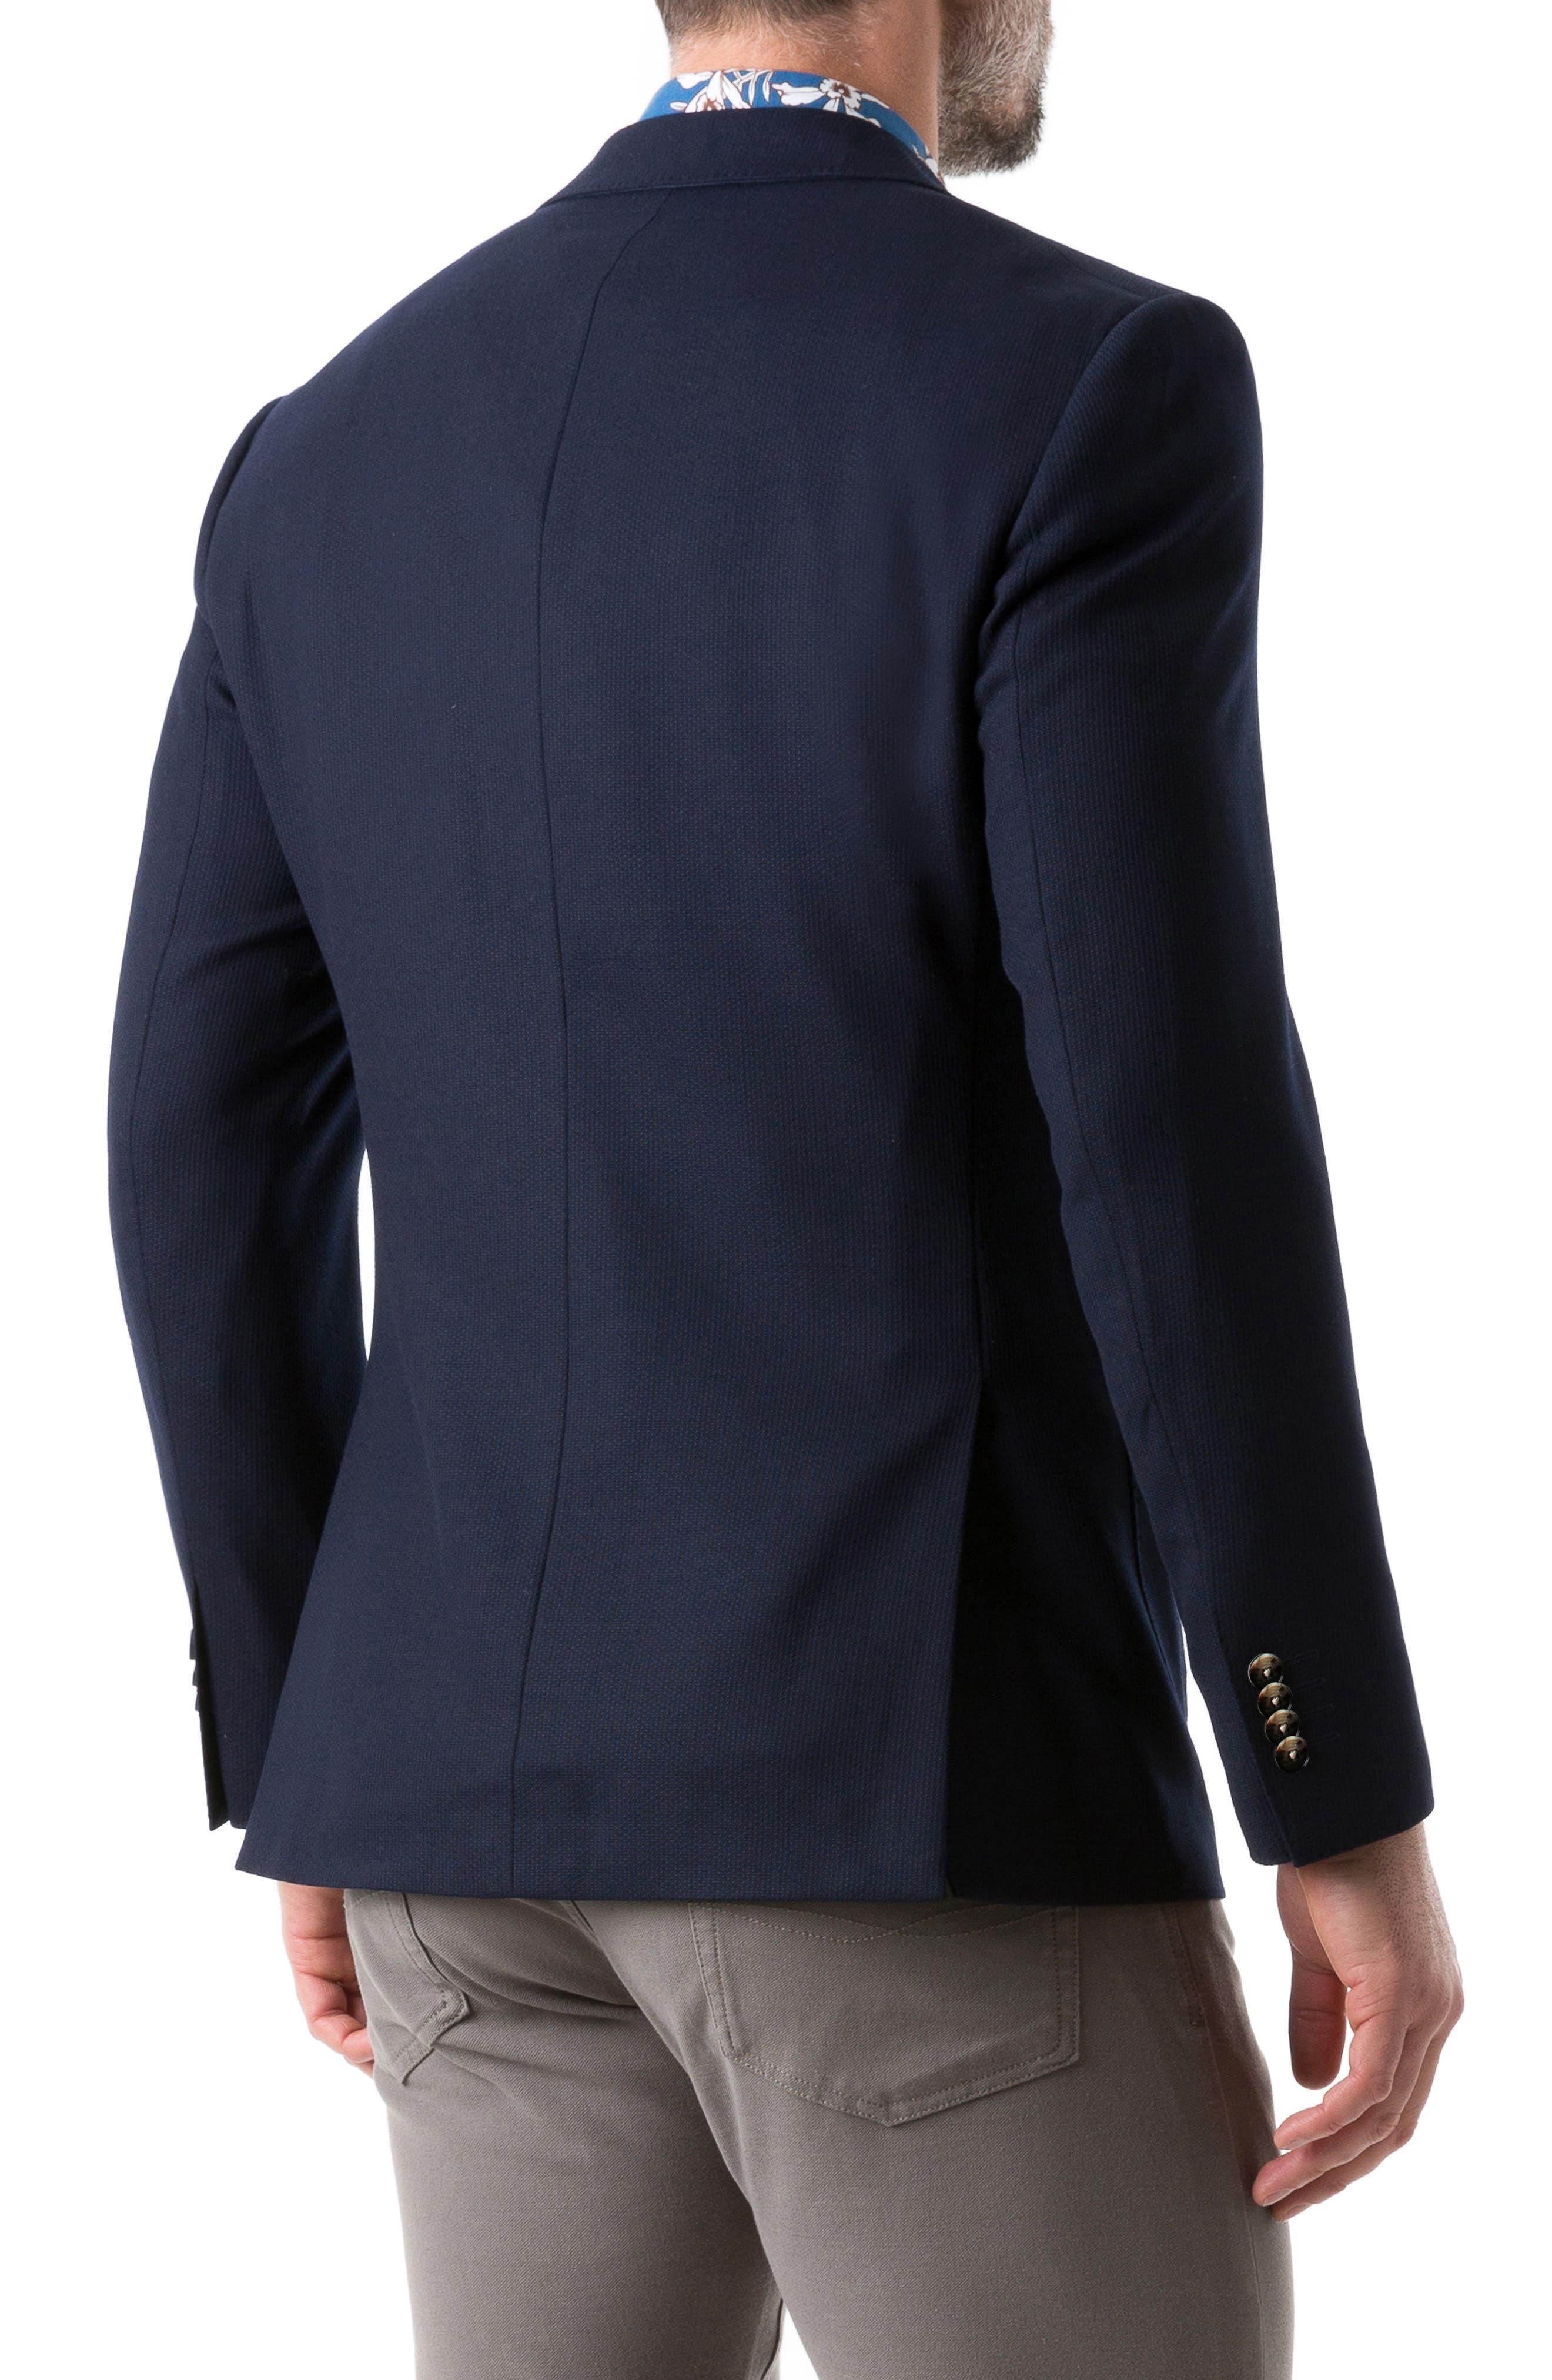 RODD & GUNN, Cotswold Regular Fit Wool Sport Coat, Alternate thumbnail 2, color, 412